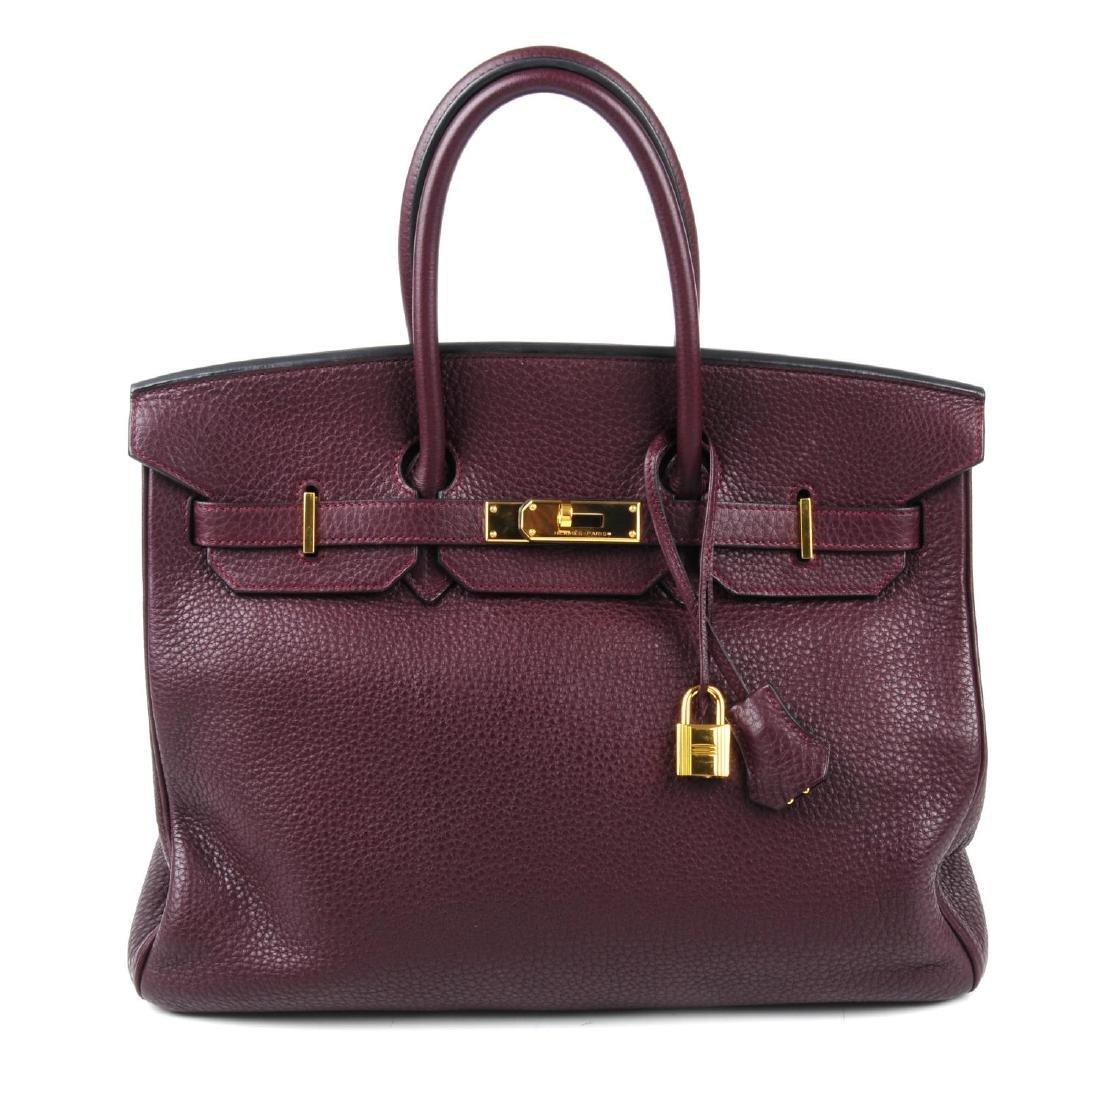 HERMÈS - a plum Clemence Birkin 35 handbag. Designed